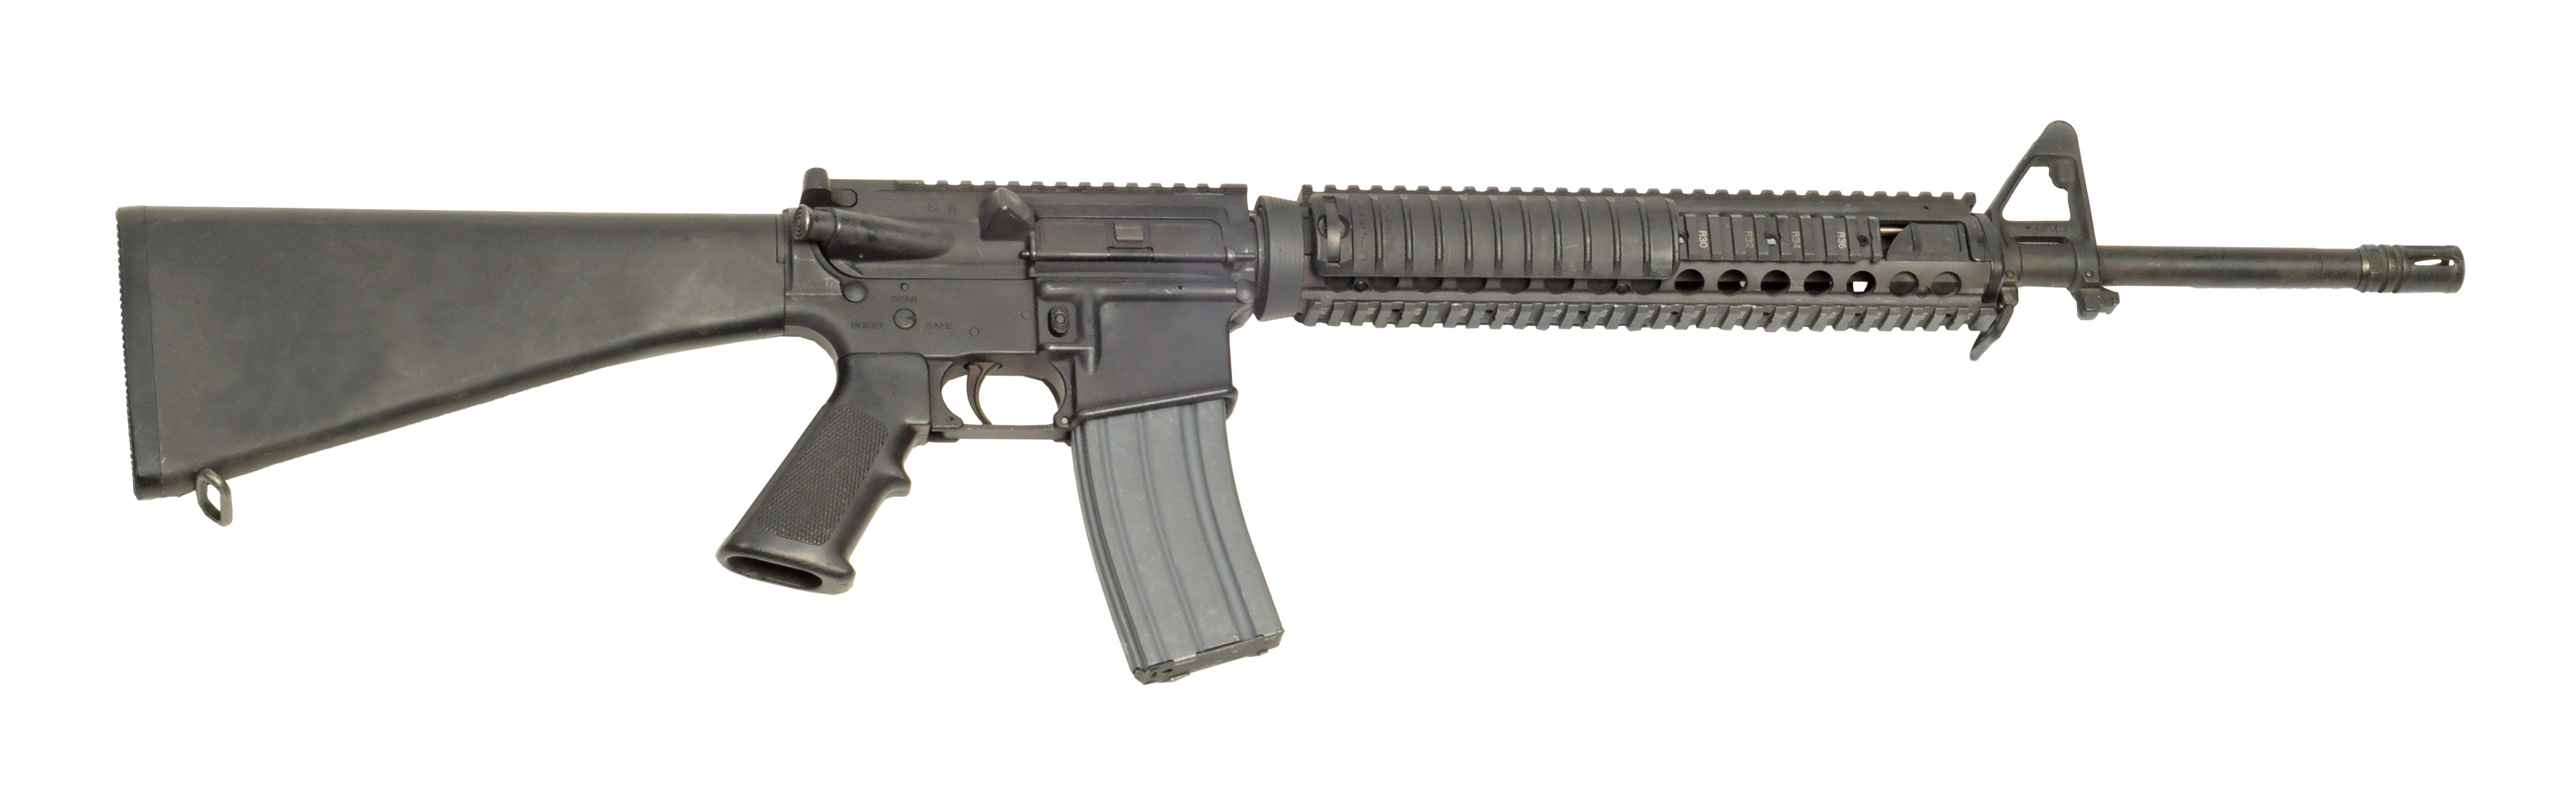 File:PEO M16A4 Rifle.jpg - Wikimedia Commons